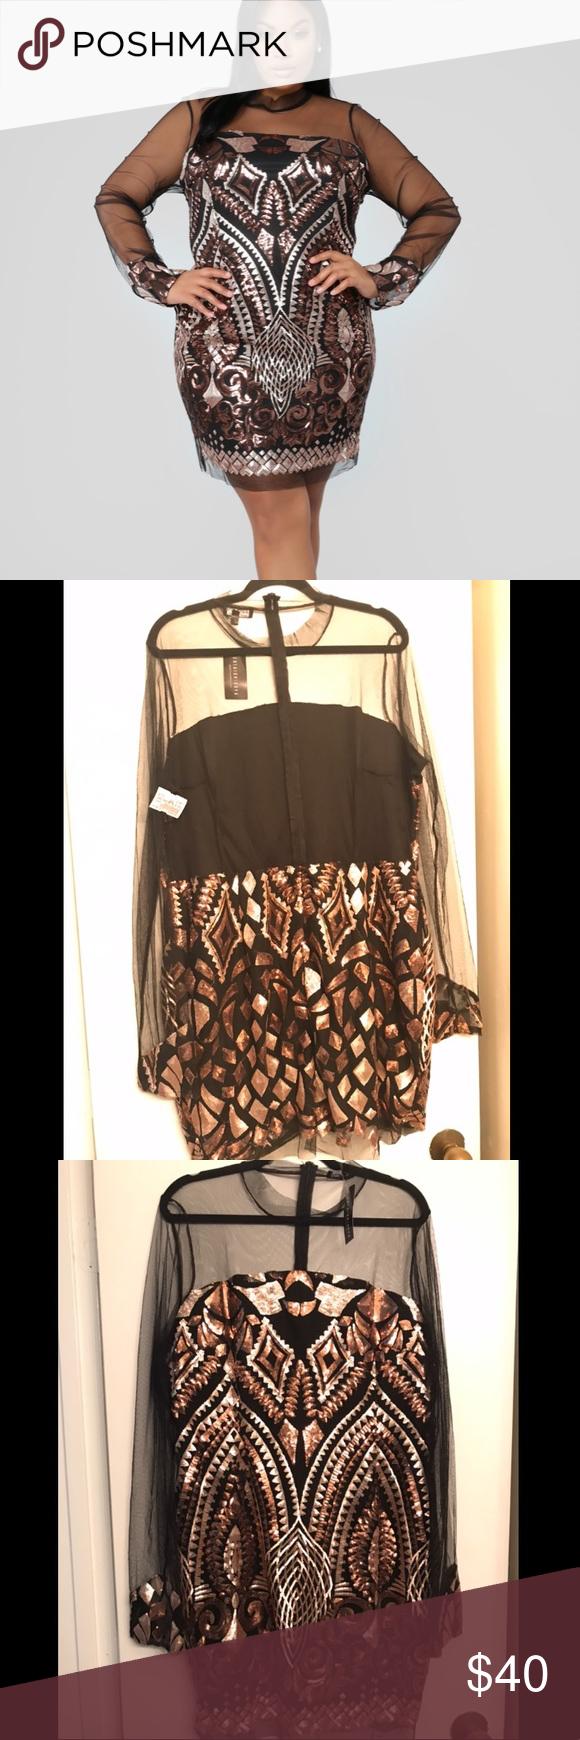 Fashion Nova Marquee Sequin Dress NWT Size 3X Fashion